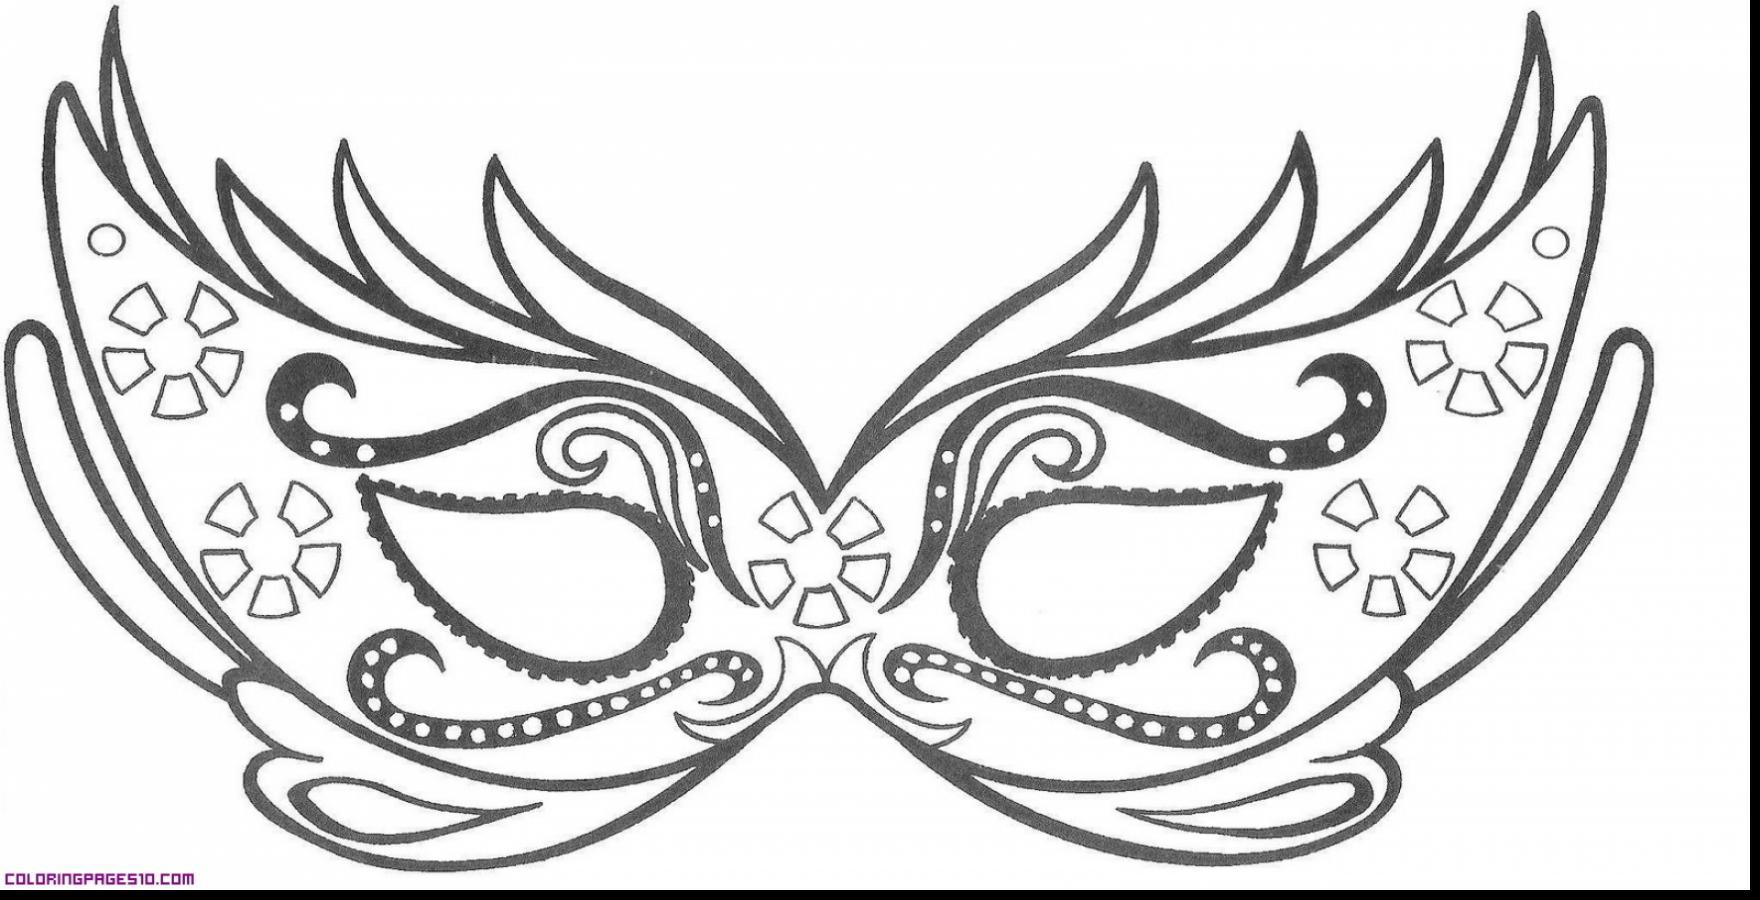 1760x900 Mardi Gras Masks Coloring Pages Impressive Carnival Masks Coloring